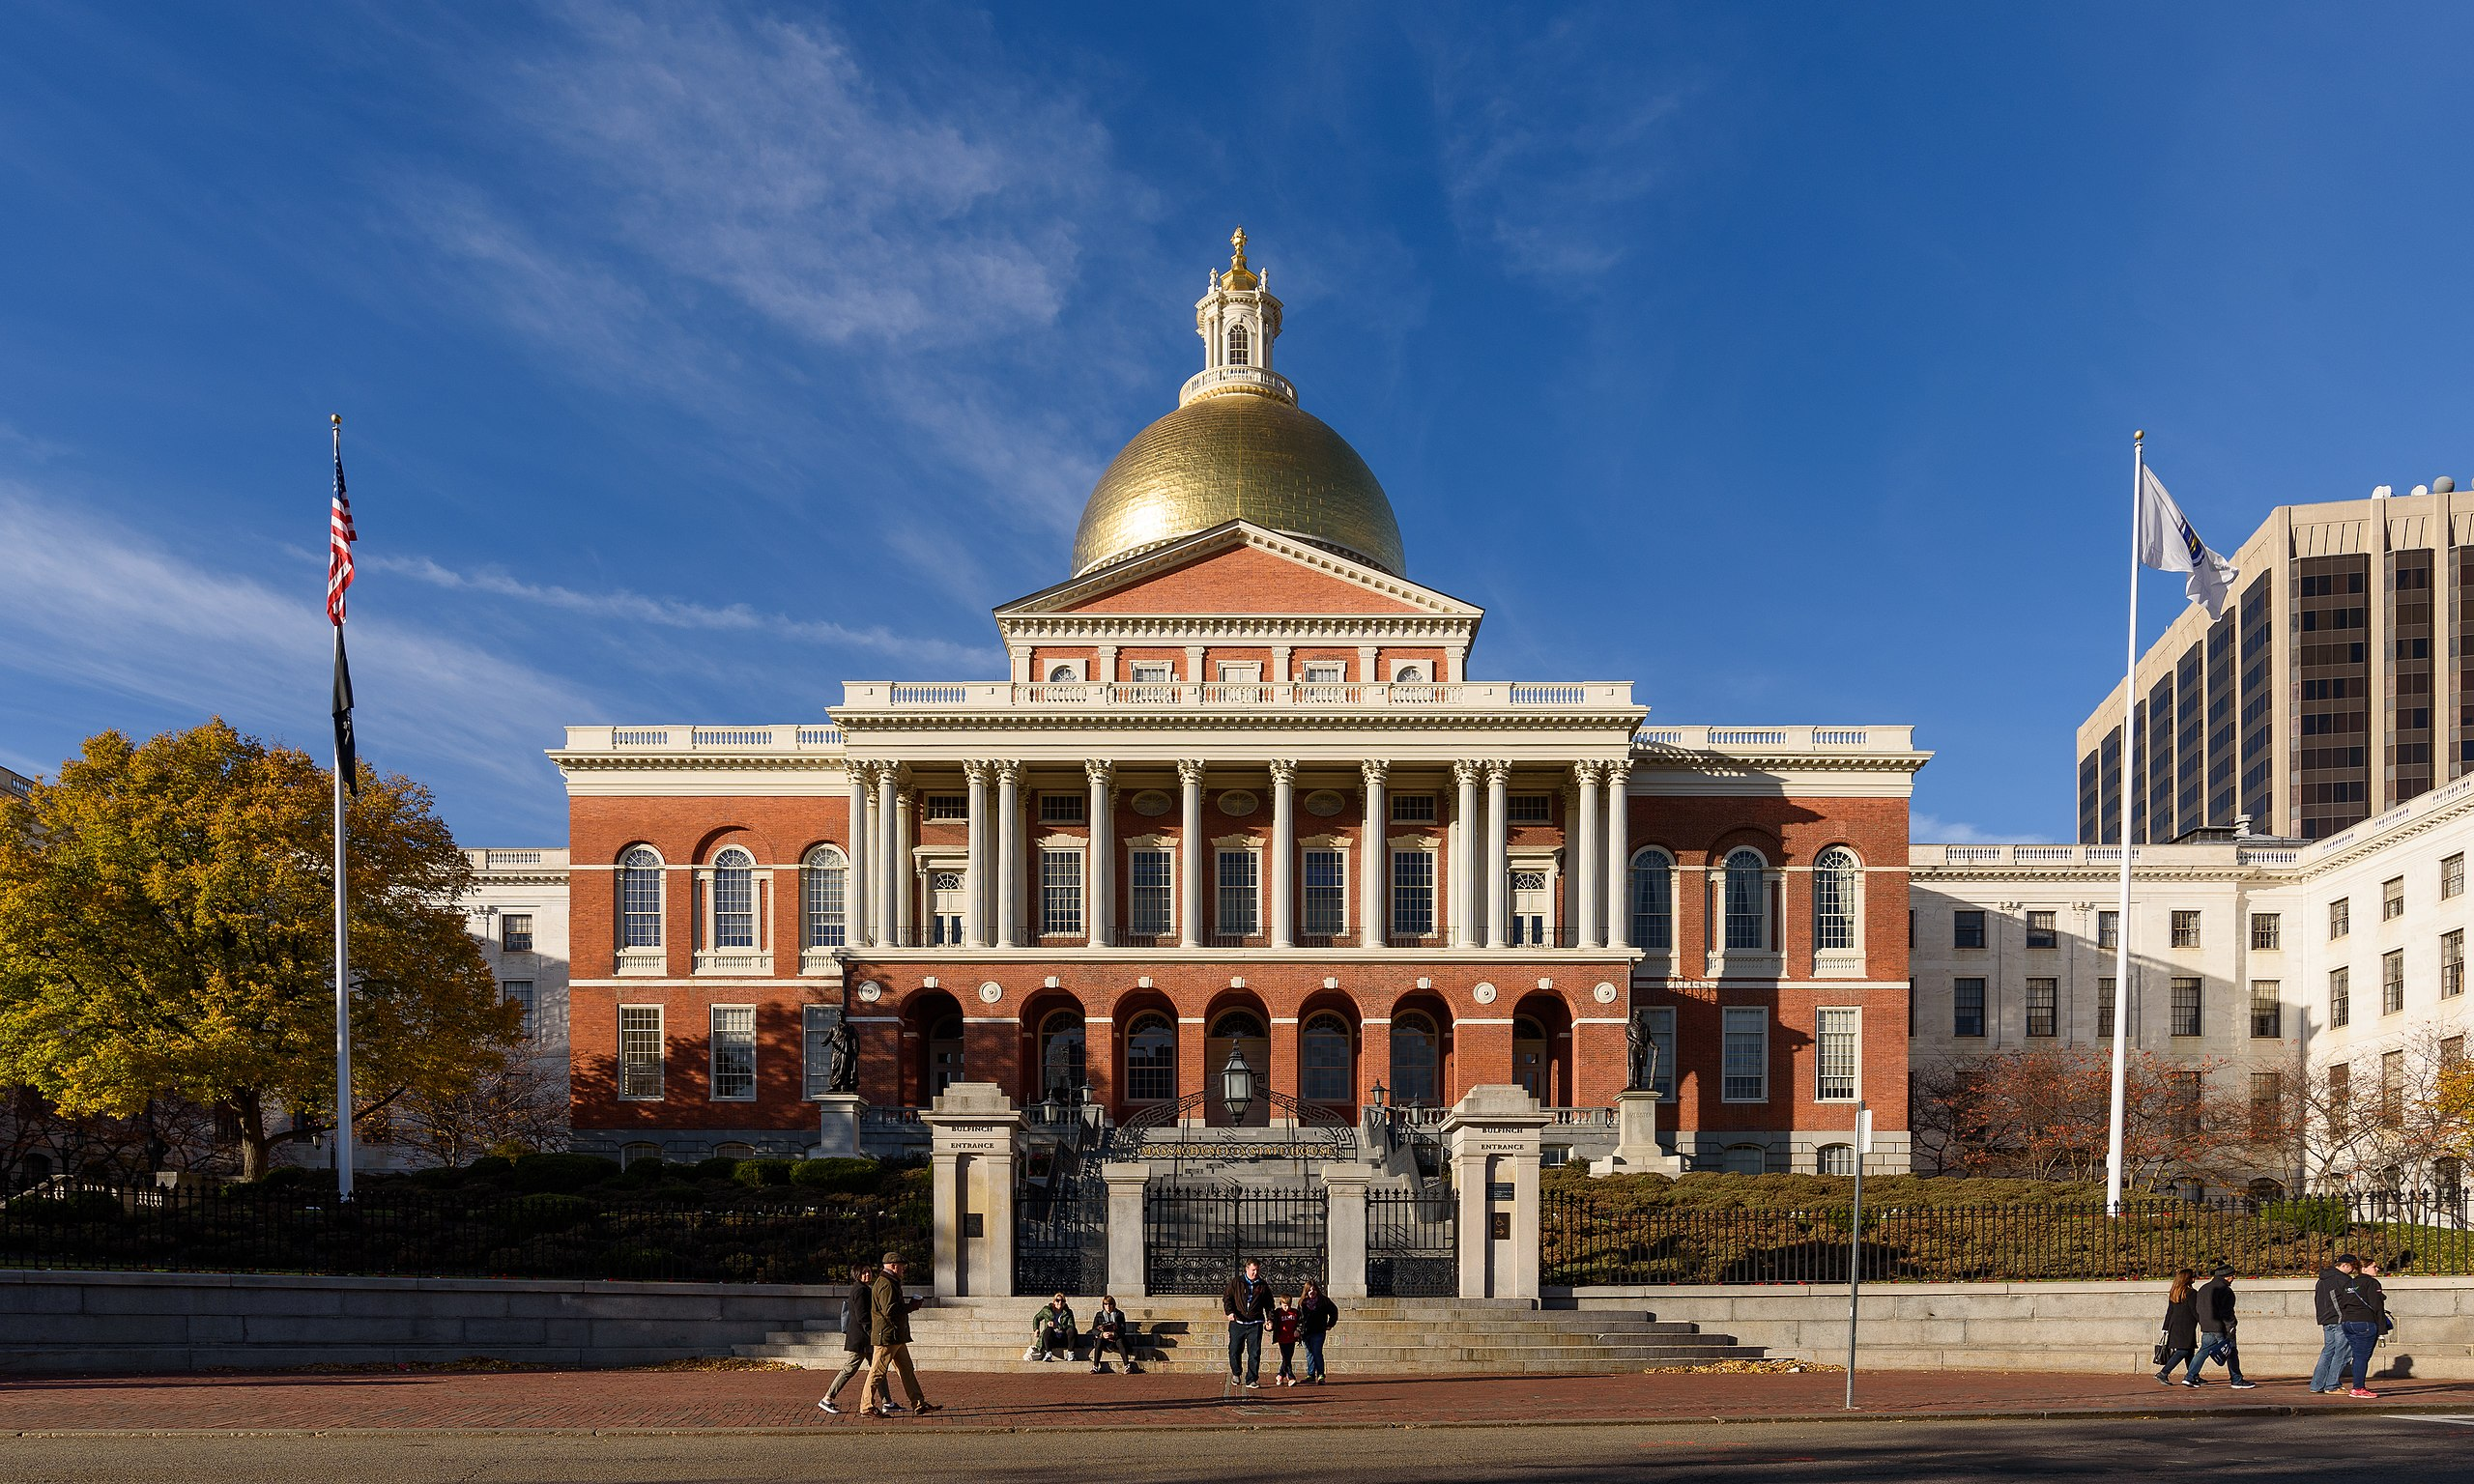 Statement in response to Governor Baker vetoing Massachusetts'  climate bill